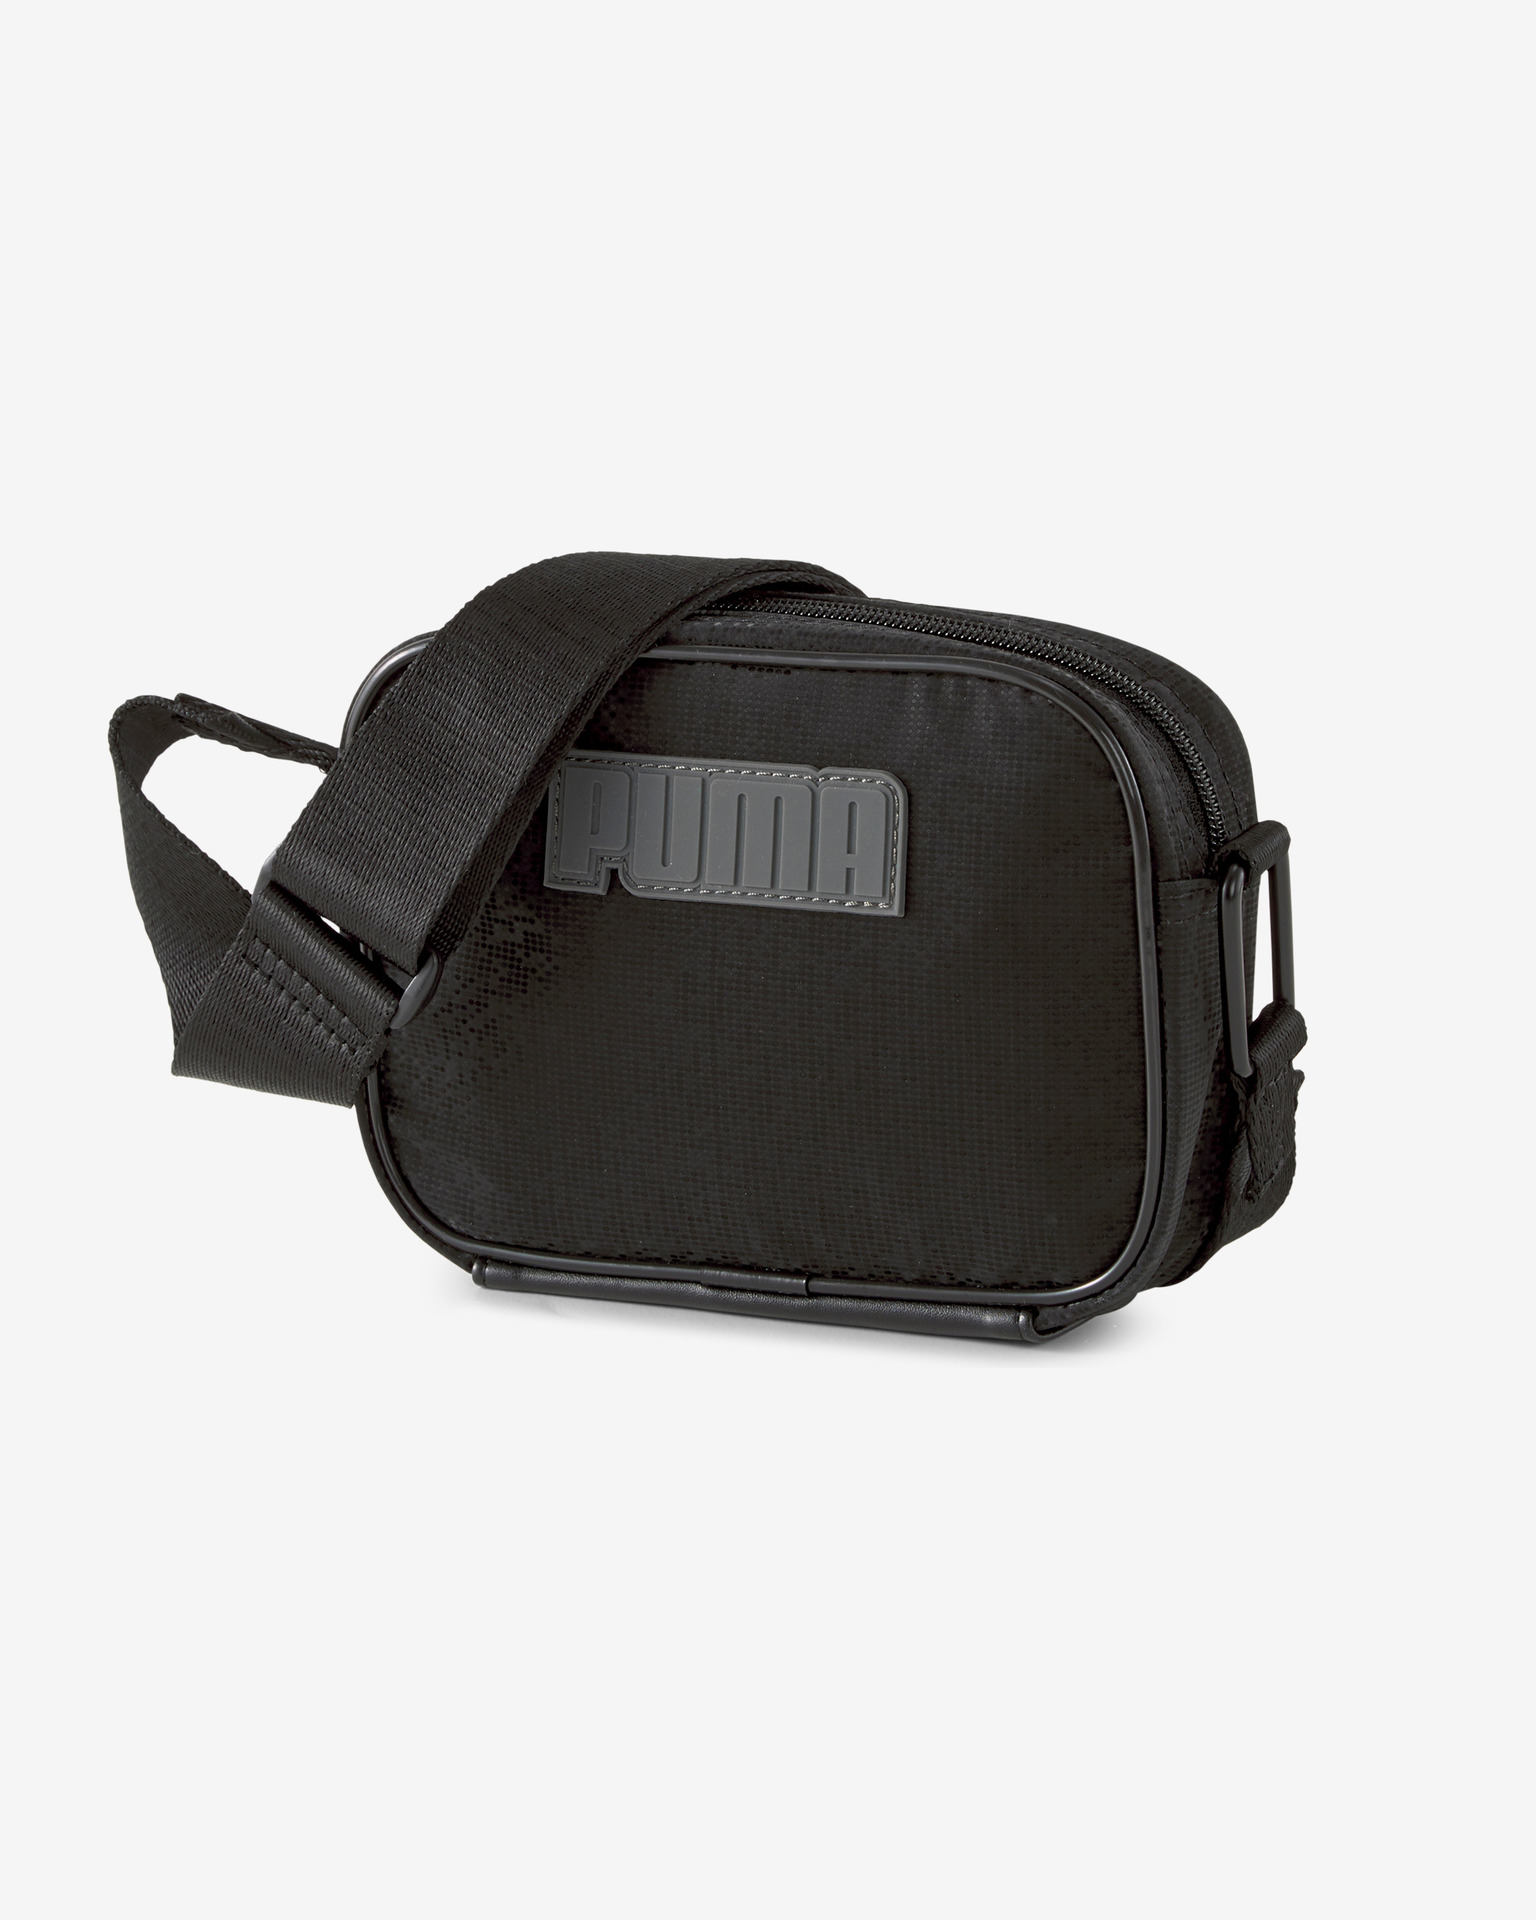 Puma Prime Time Cross body bag Black